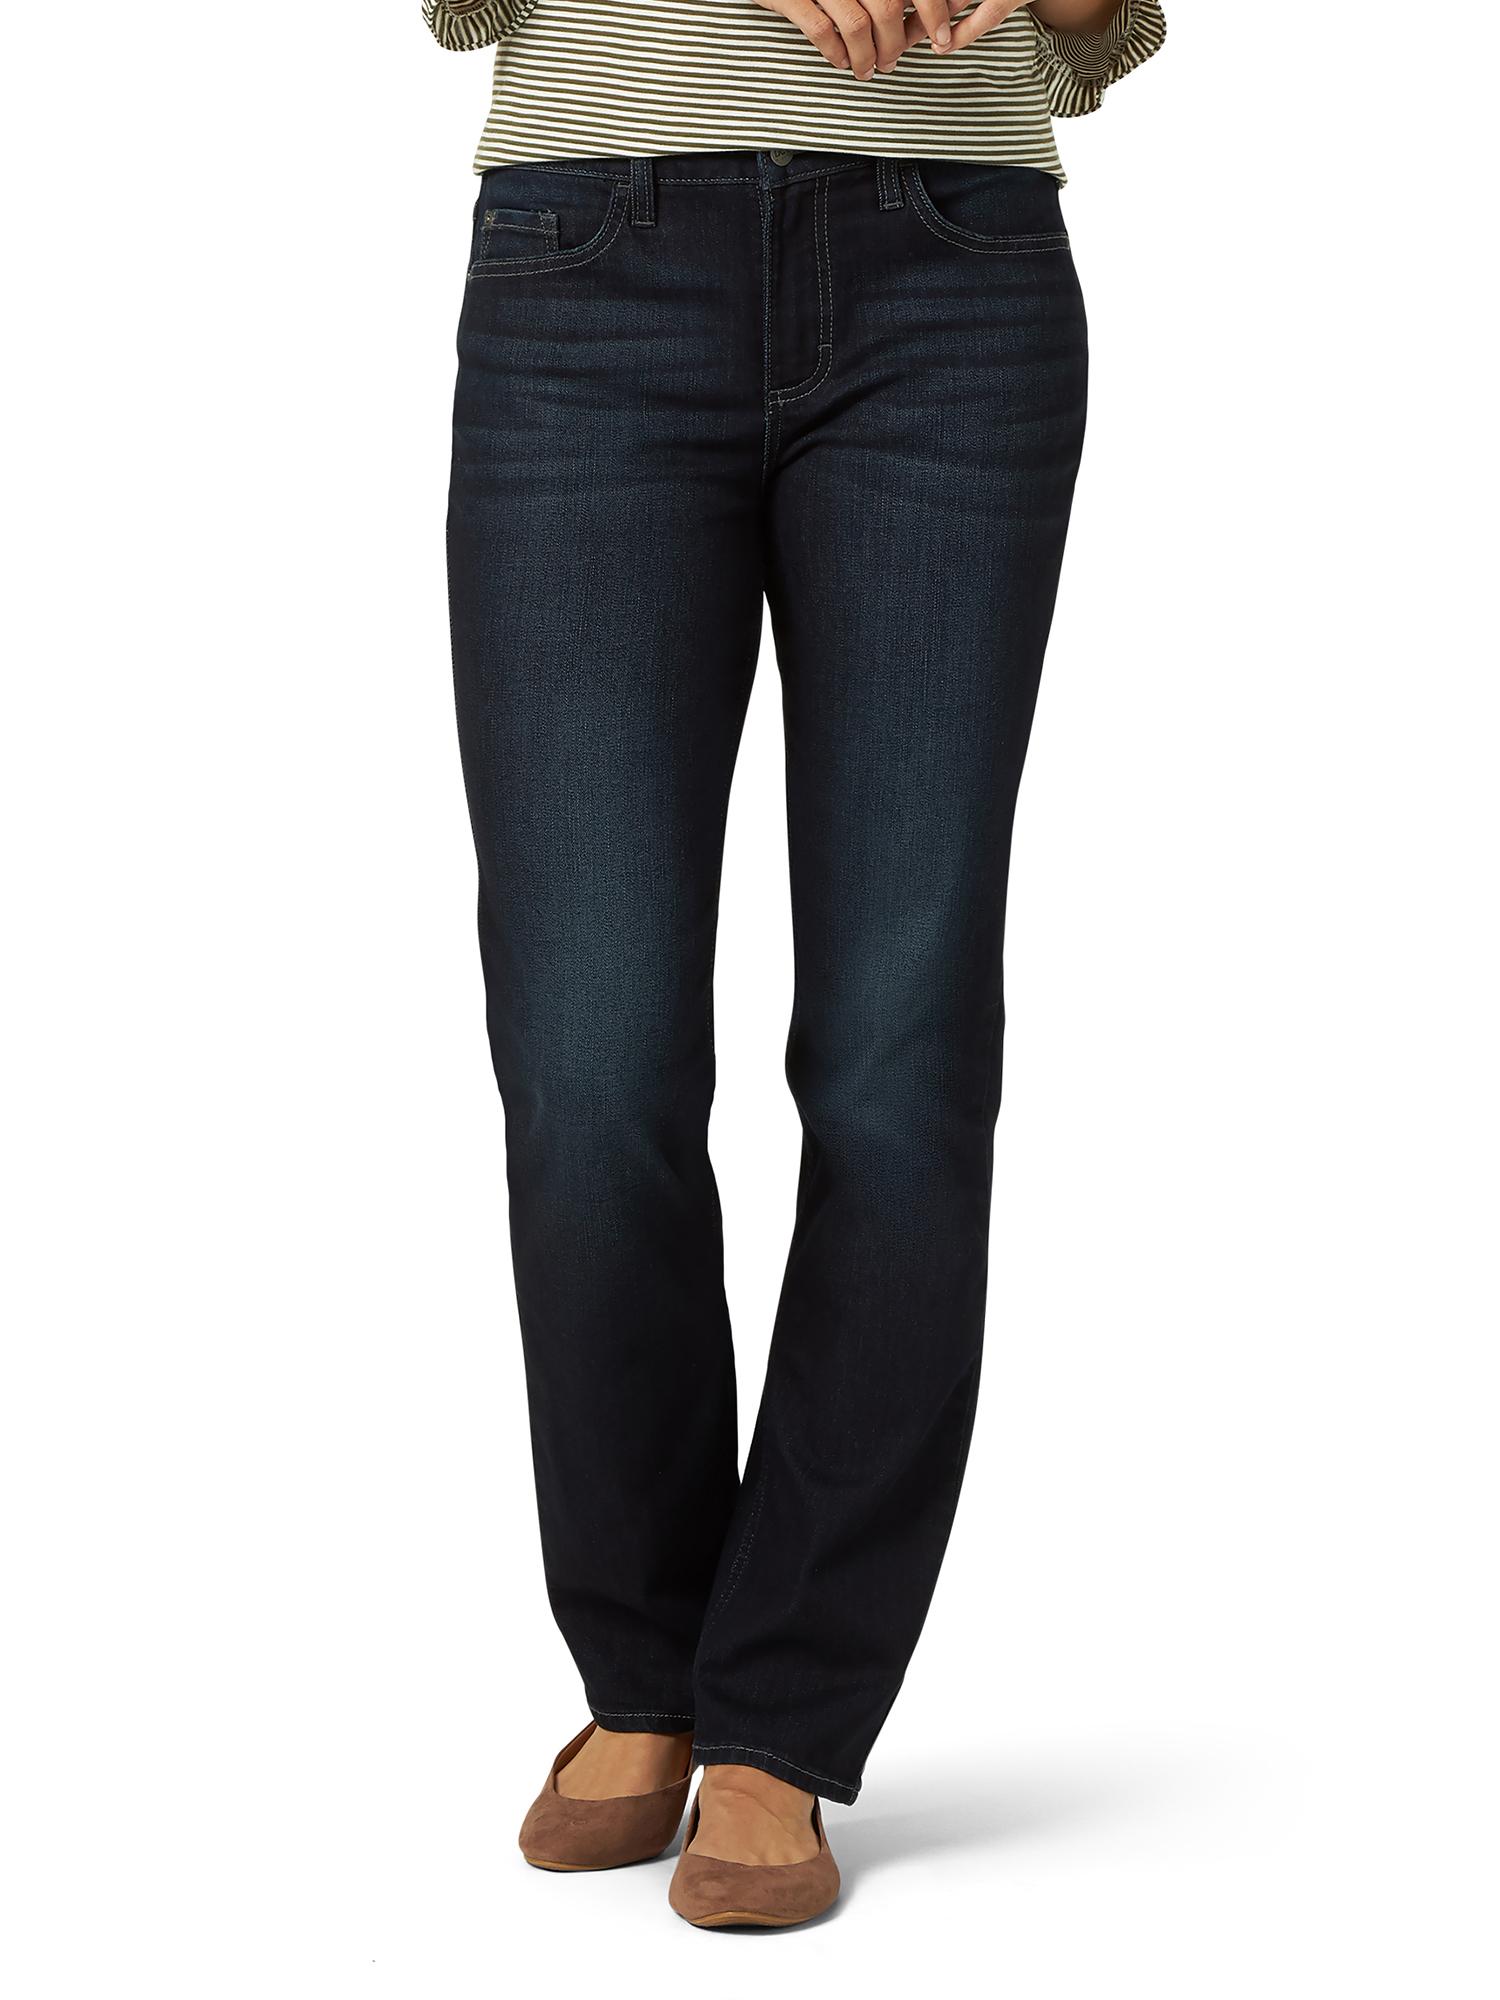 Rewash Juniors Striped Snap-Side Jeans